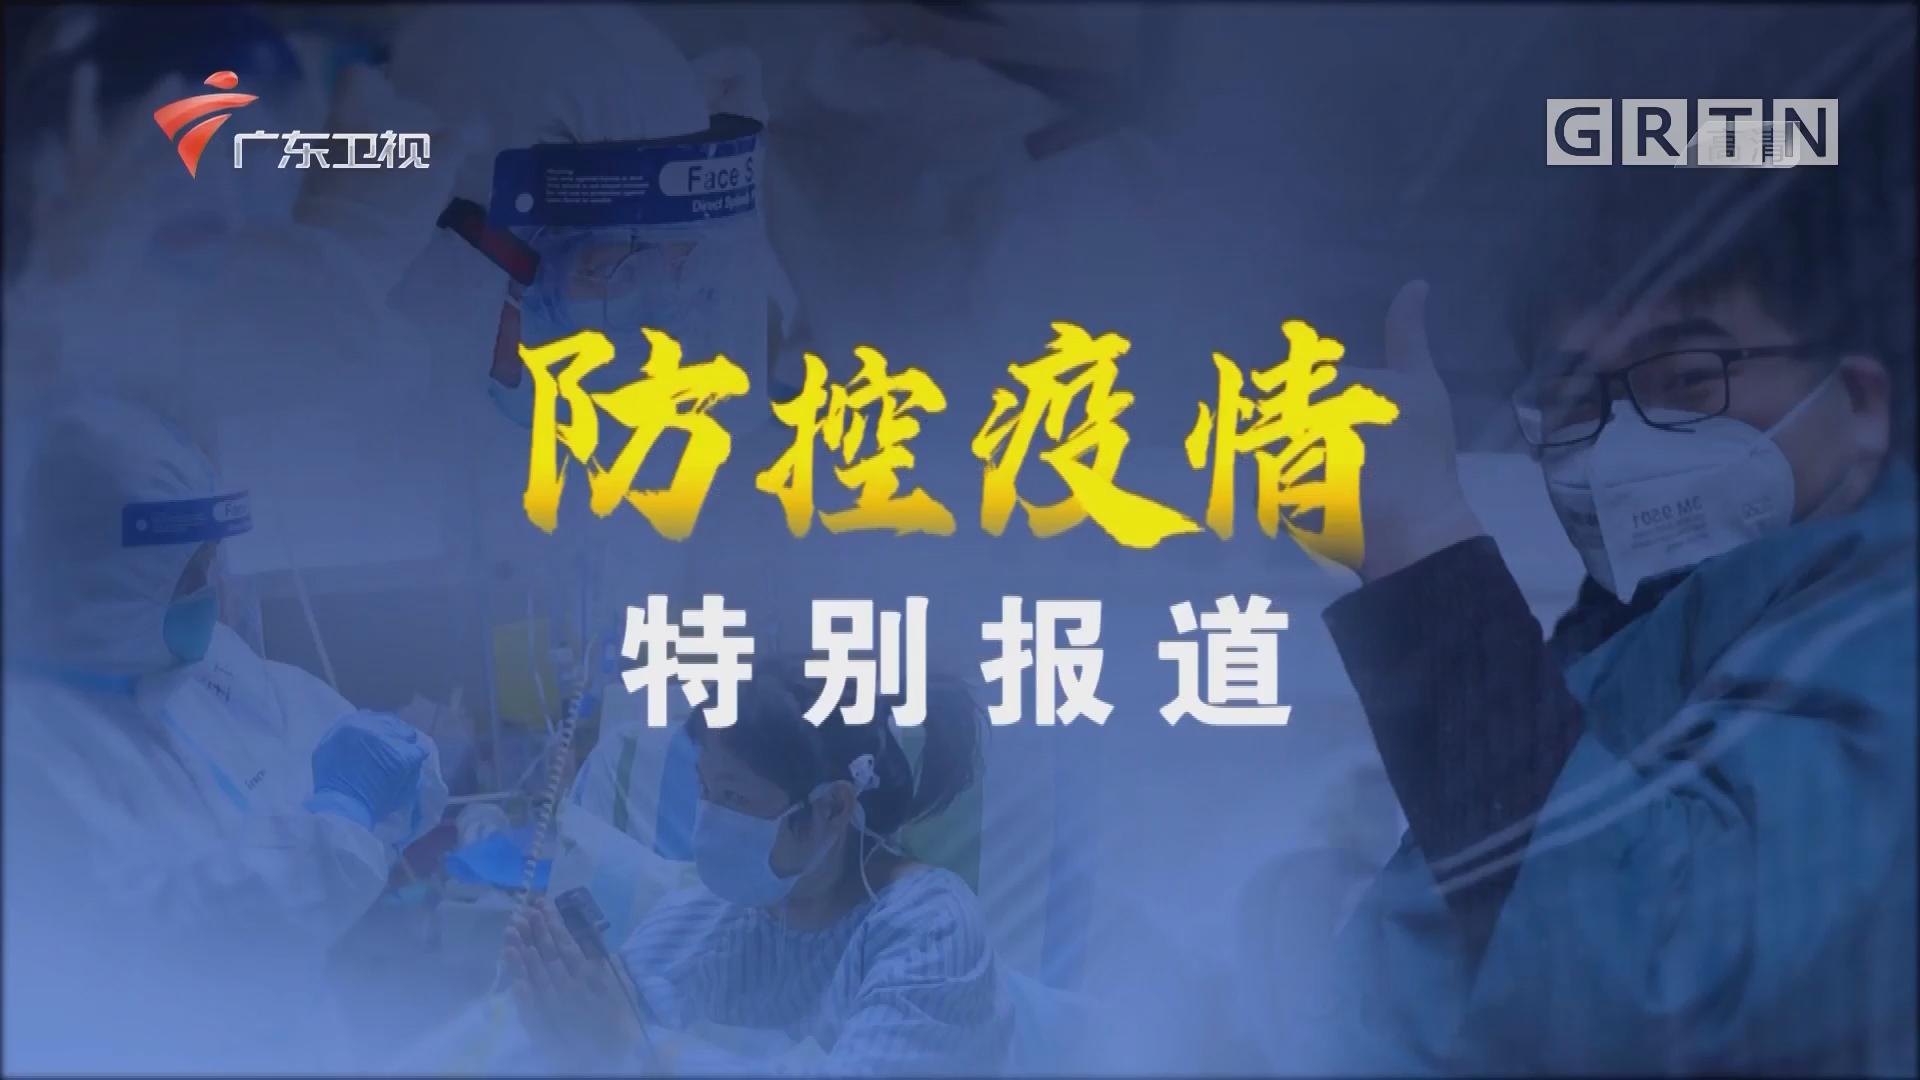 [HD][2020-04-01]防控疫情特别报道:李希到汕头调研检查疫情防控和经济社会发展工作